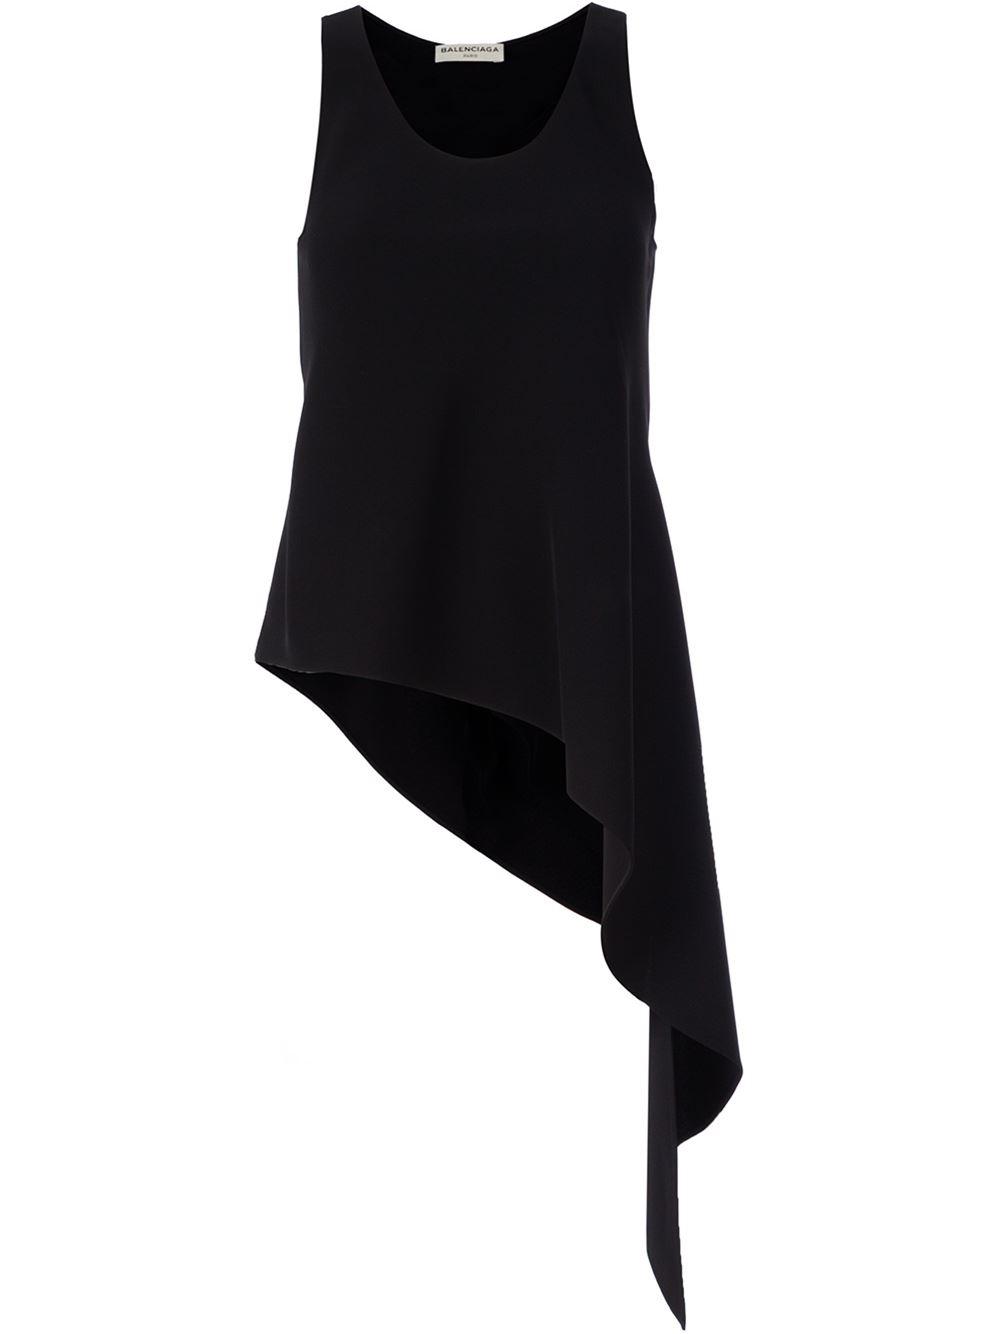 a7825bc4f24ea8 Lyst - Balenciaga Asymmetric Hem Sleeveless Top in Black